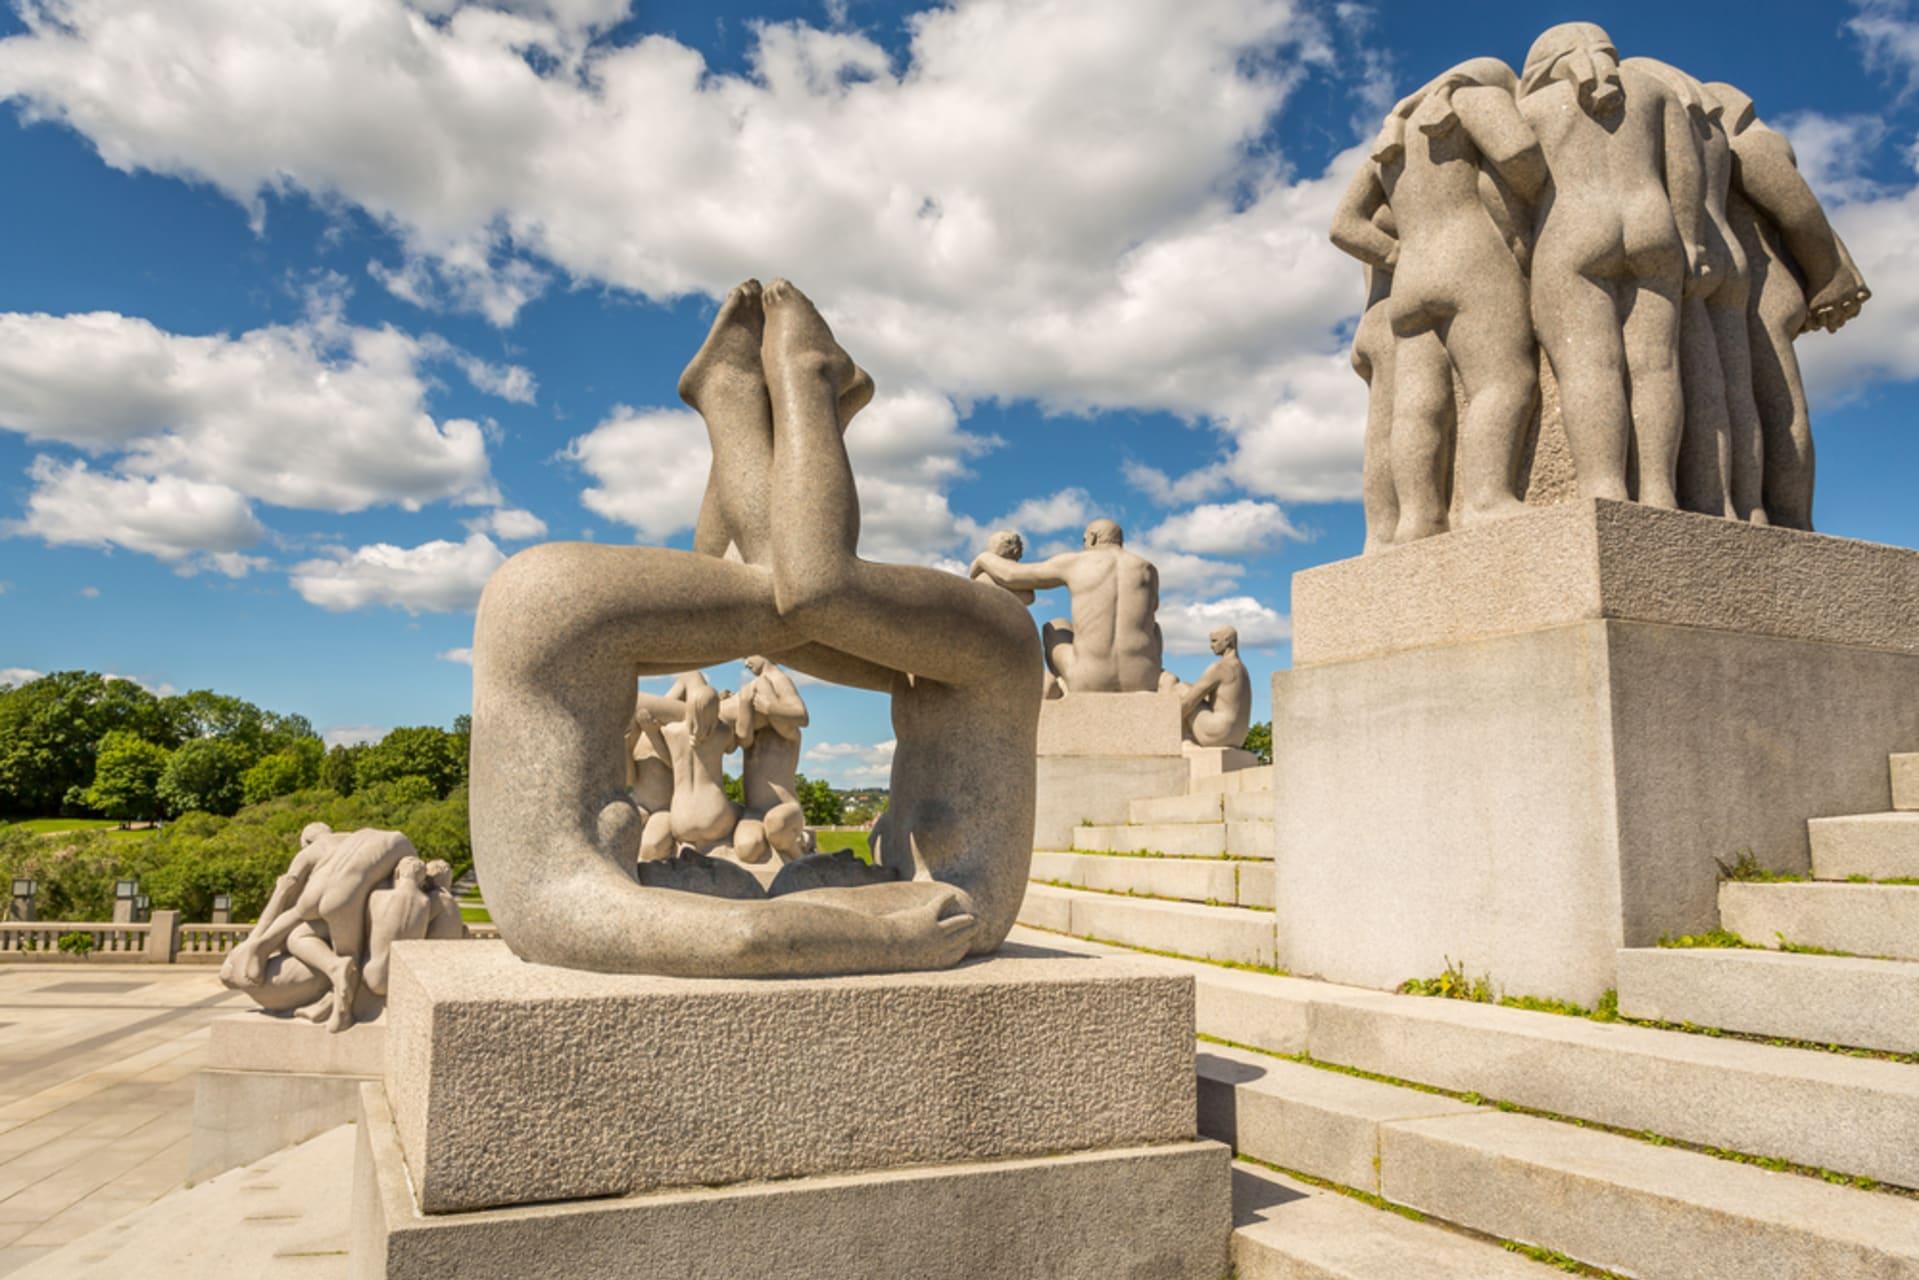 Oslo - Norwegian Cultural Heritage: Vigeland Sculpture Park